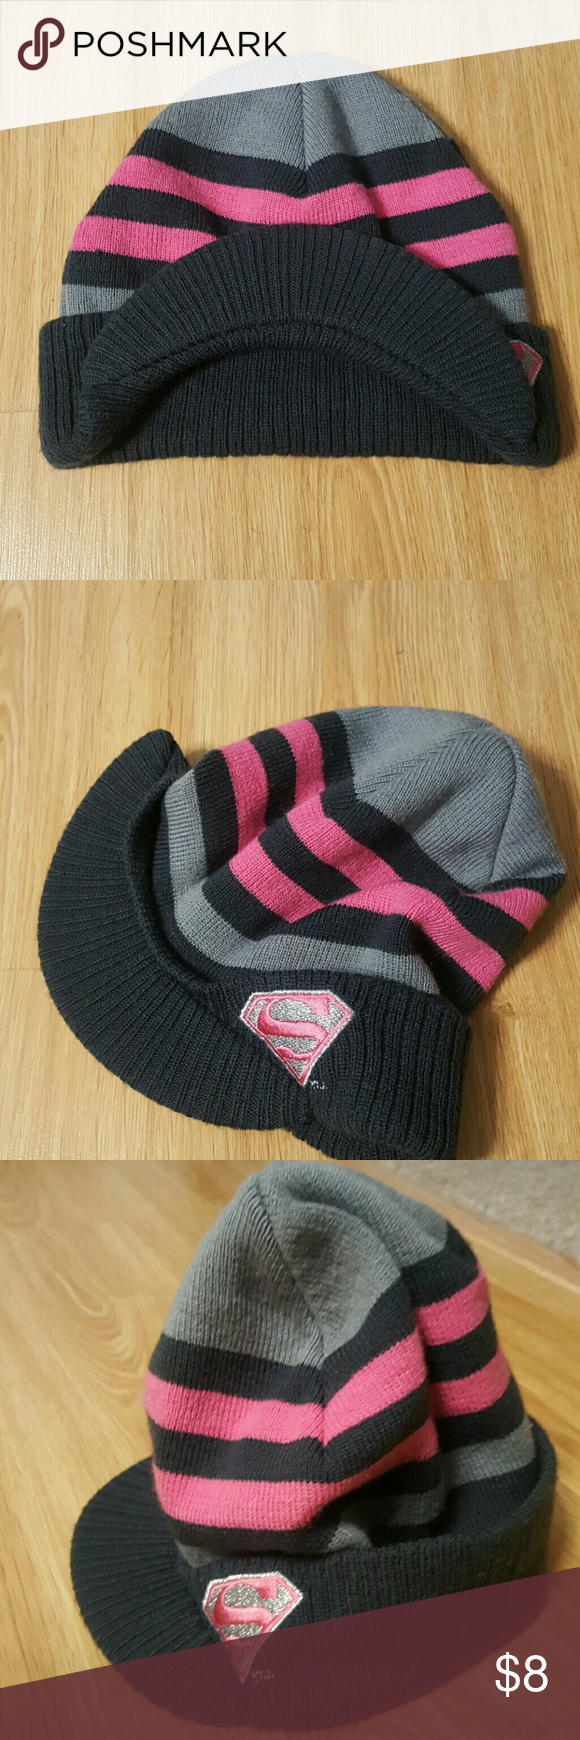 76b255a3cf5 Kids Pink Superman Winter Hat NWT